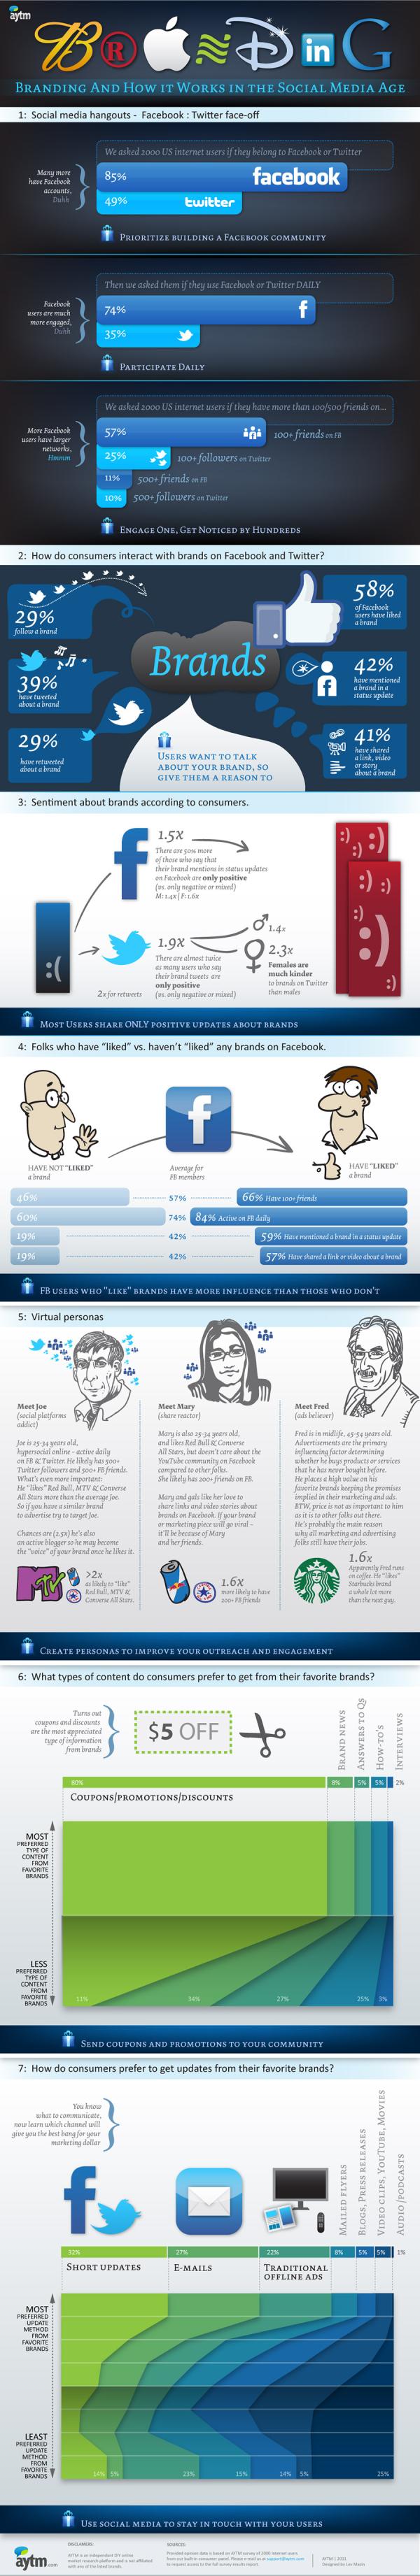 infographic Branding 02 resized 600 resized 600